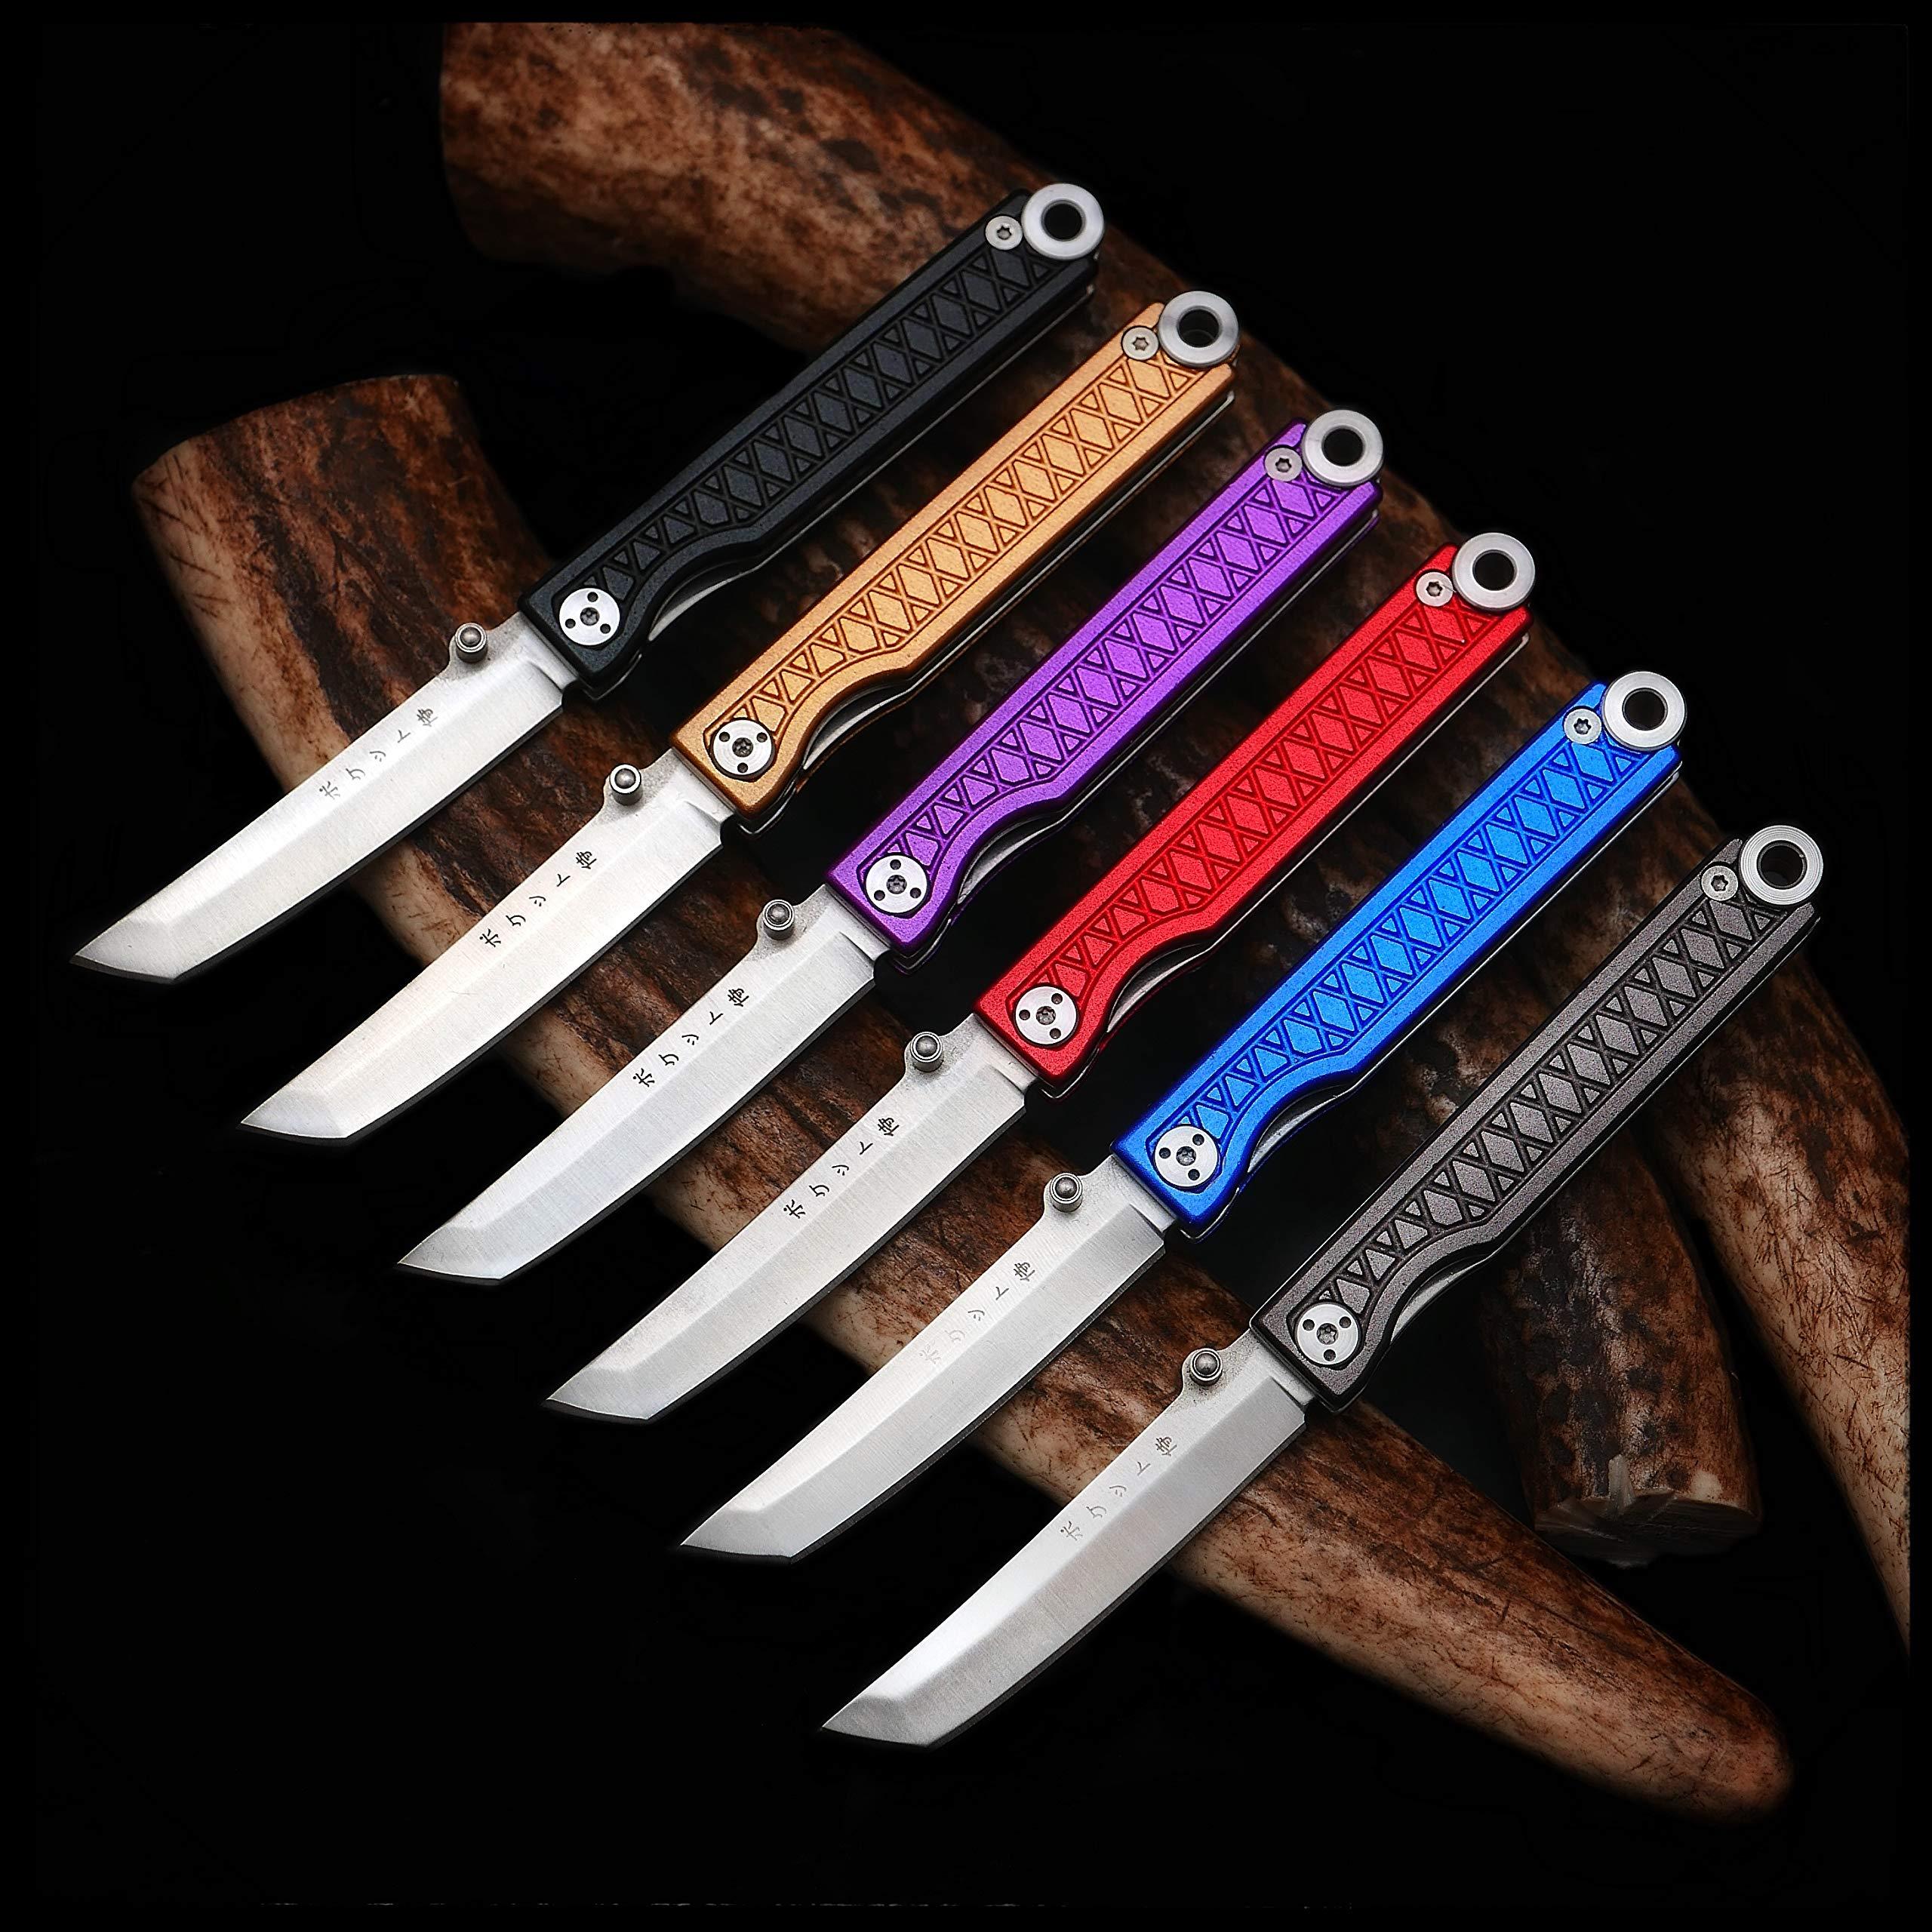 StatGear Pocket Samurai Higonokami Folding Knife 440C Stainless Steel - Aluminum Edition (Black/Black) by StatGear (Image #3)